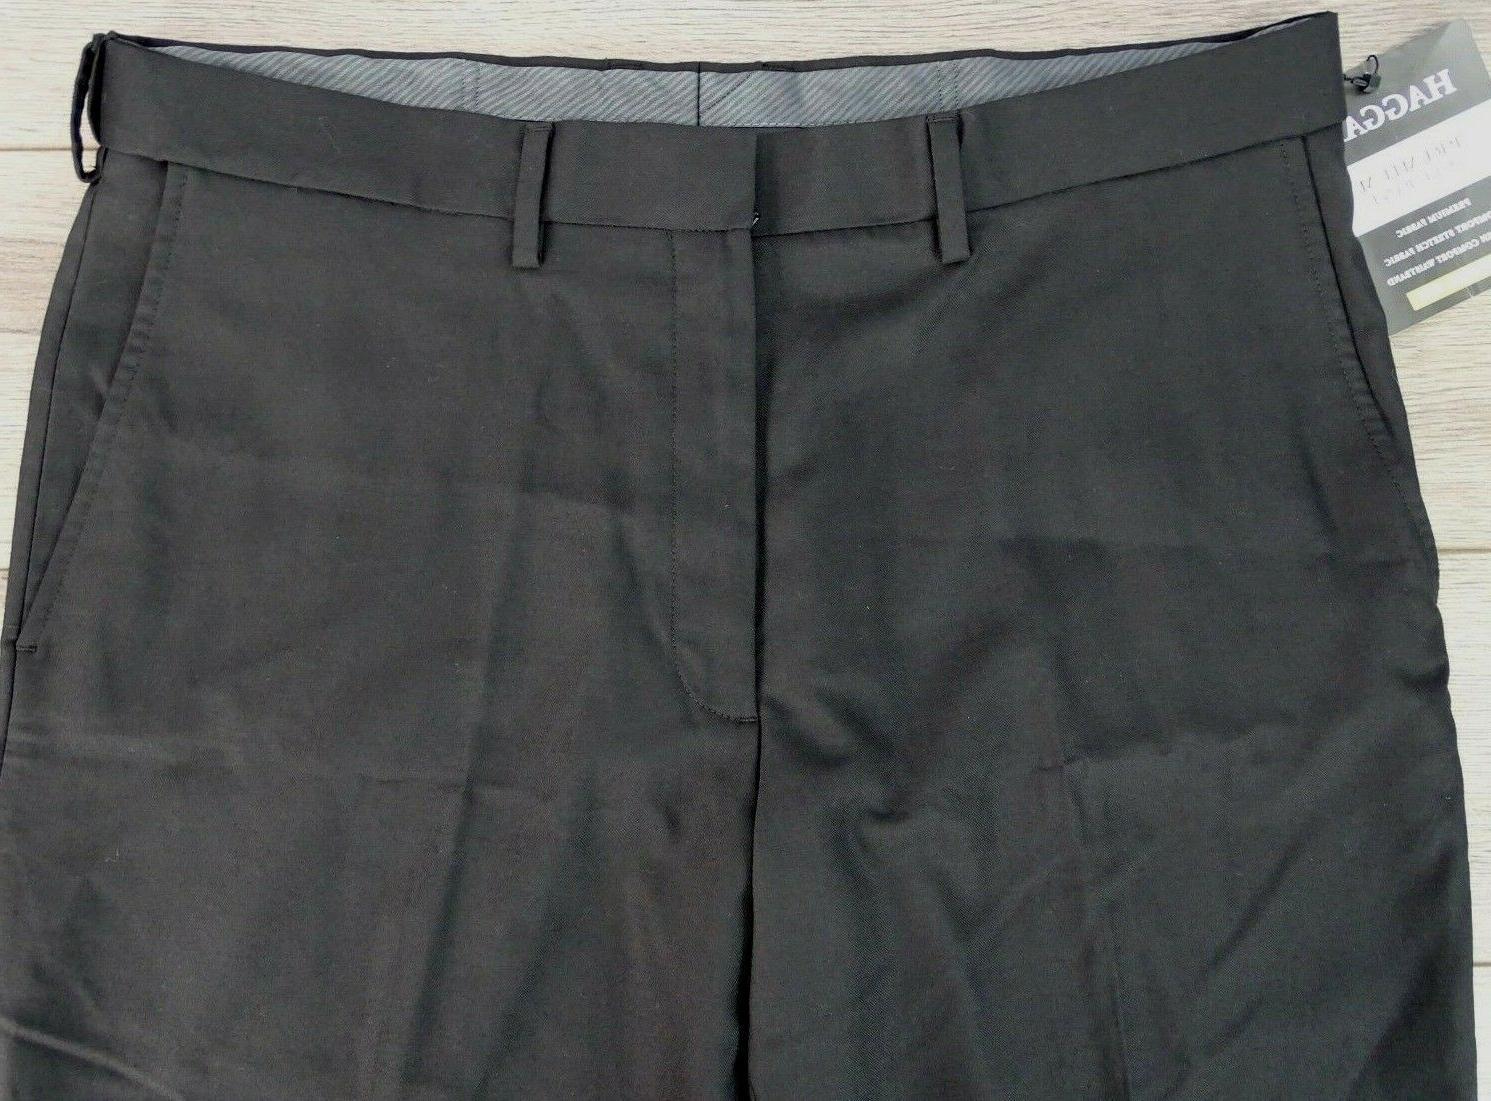 New! Stretch Suit Pant Classic Fit 36 x